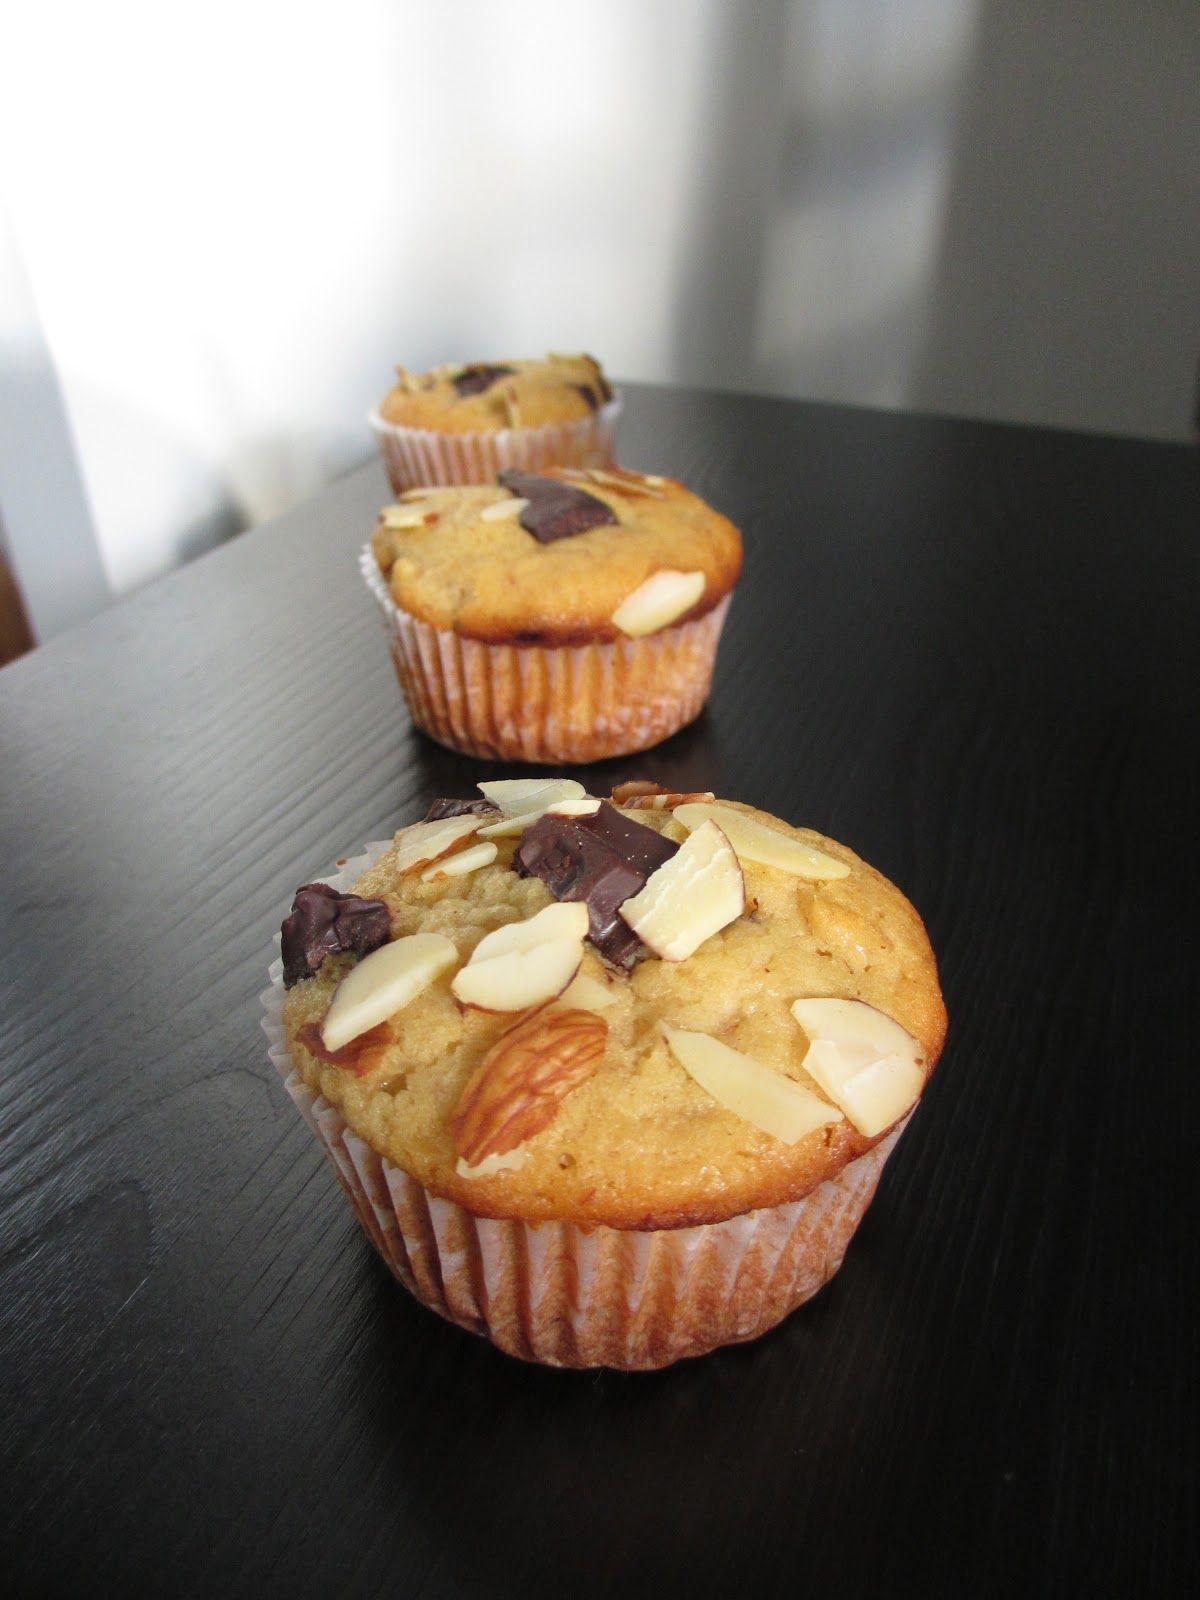 Easy Peasy Homey Banana Muffins | chilipadi's kitchen: Banana and Chocolate Muffin